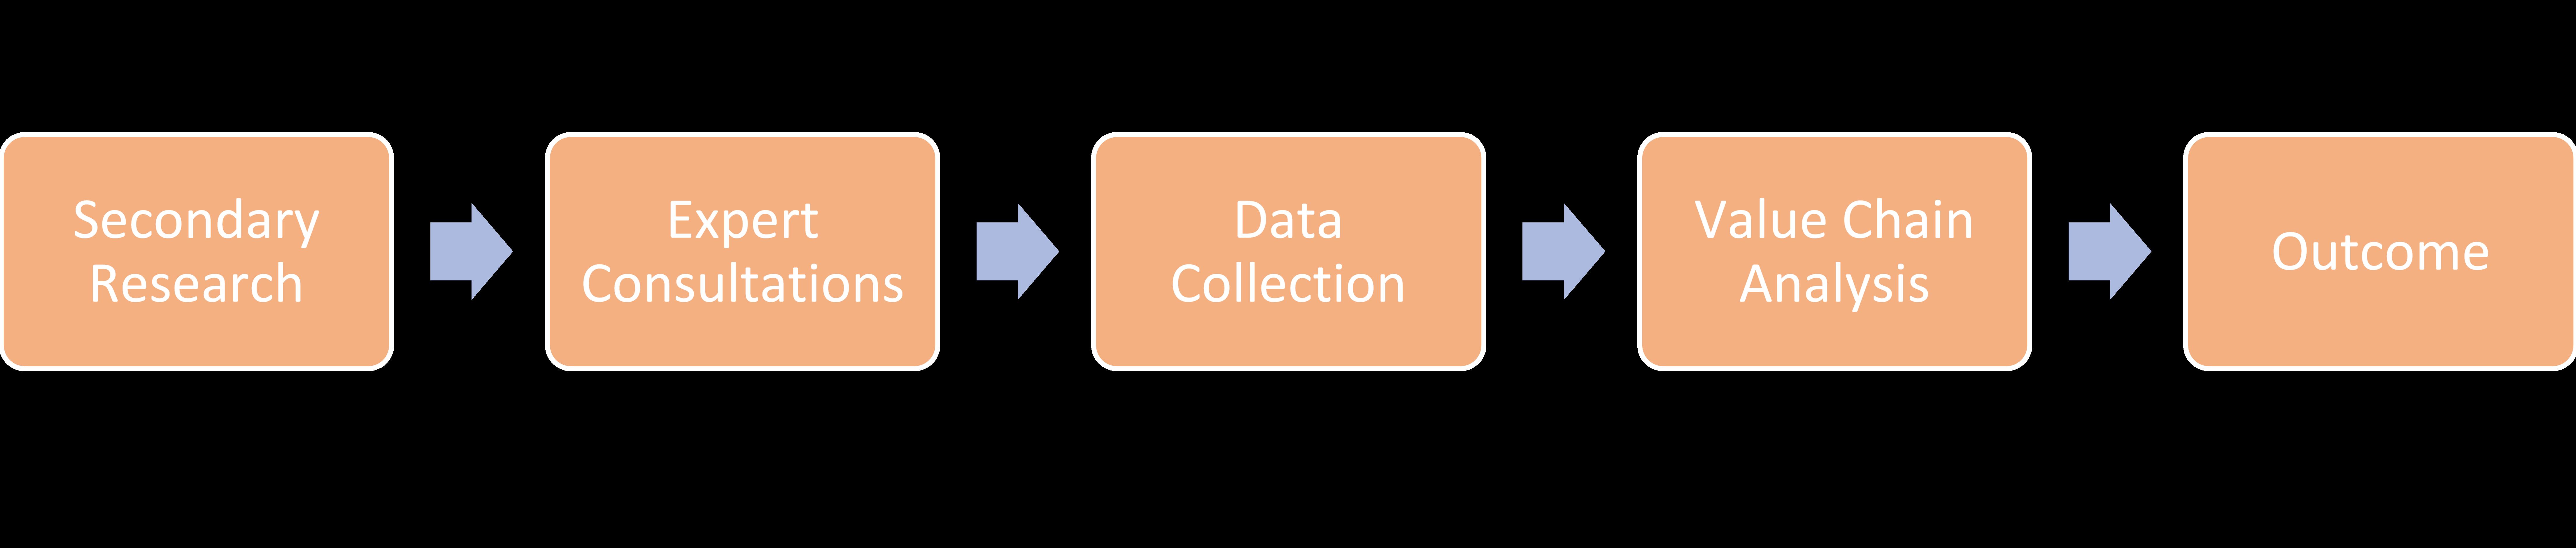 JANO Case Study Diagram